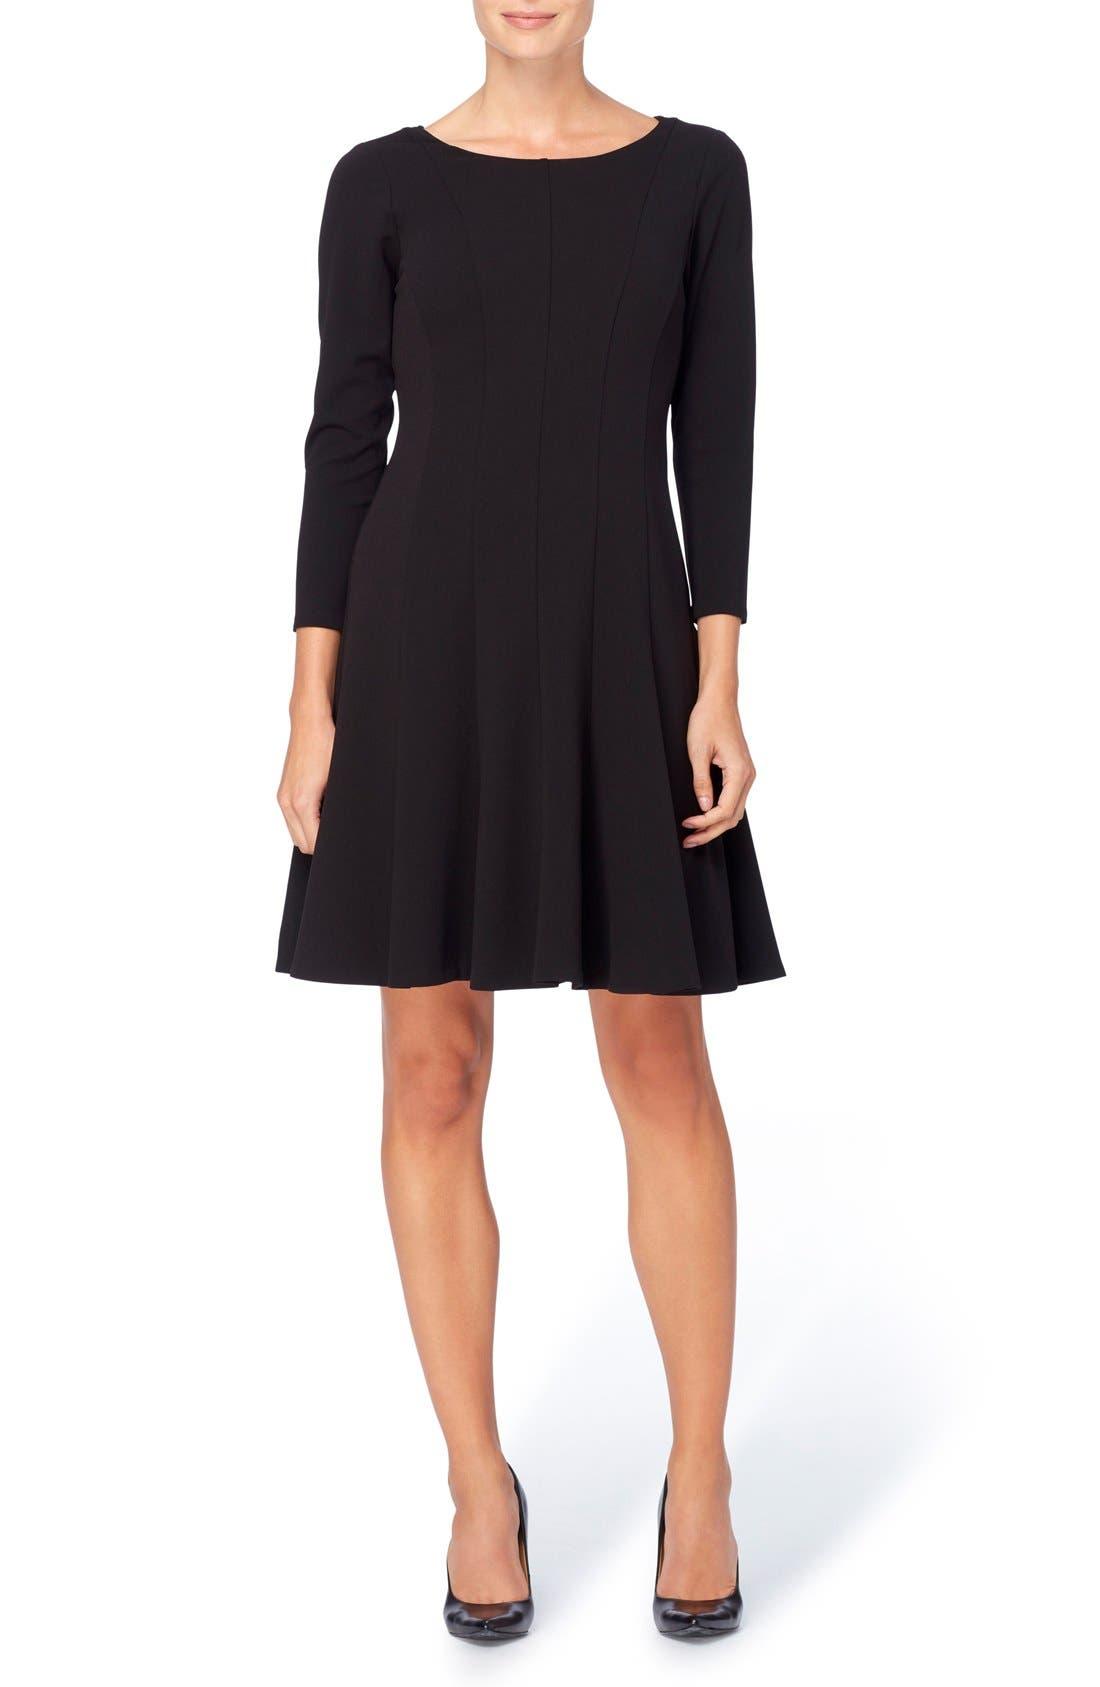 CATHERINE CATHERINE MALANDRINO Linova Fit & Flare Dress, Main, color, 003